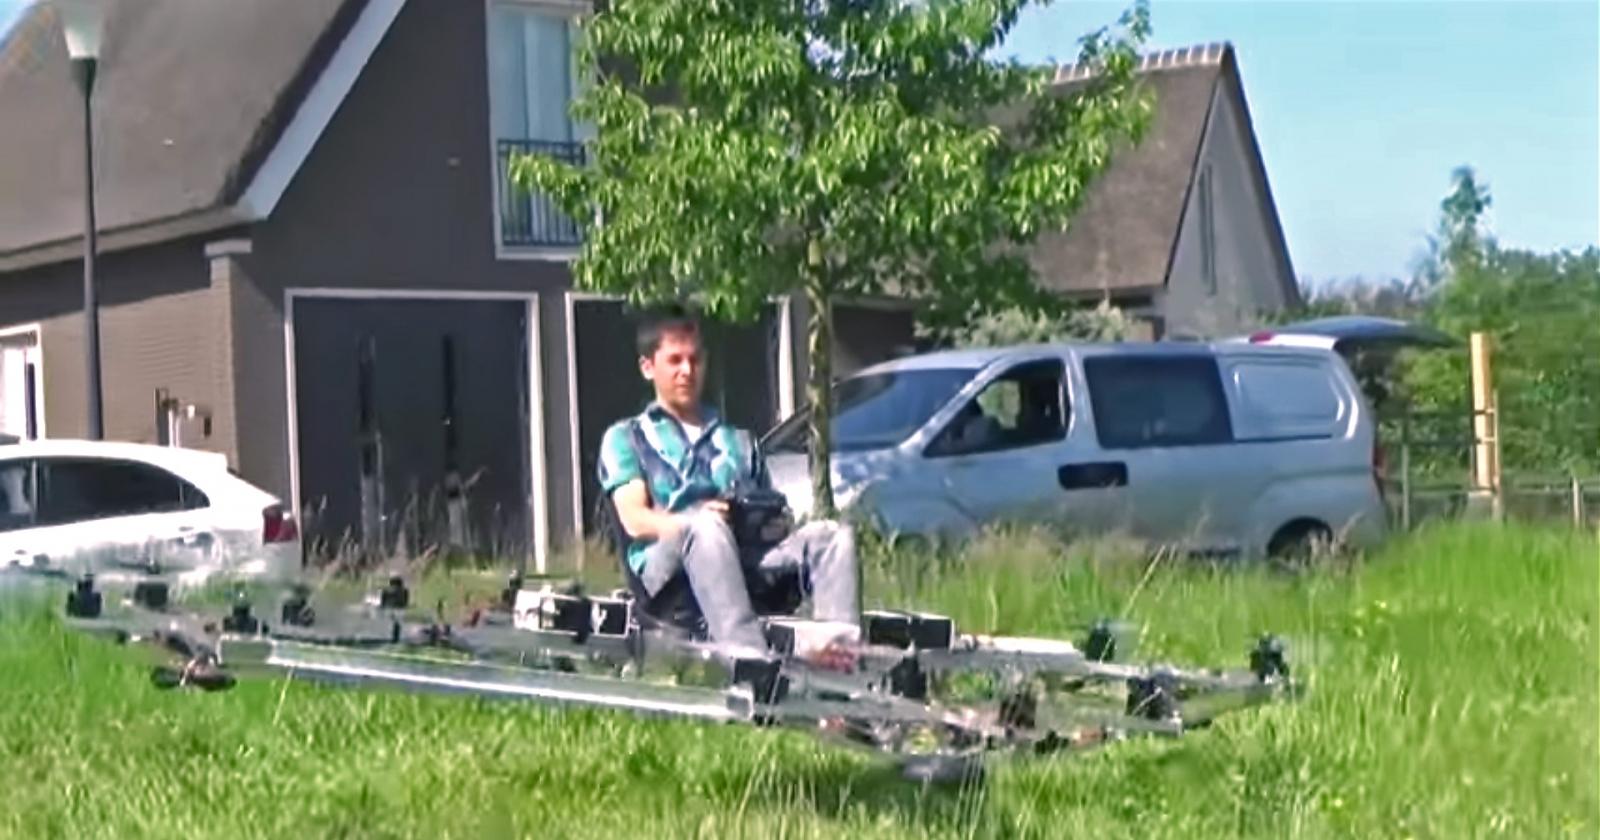 Thorstin Crijns testing his personal flight vehicle